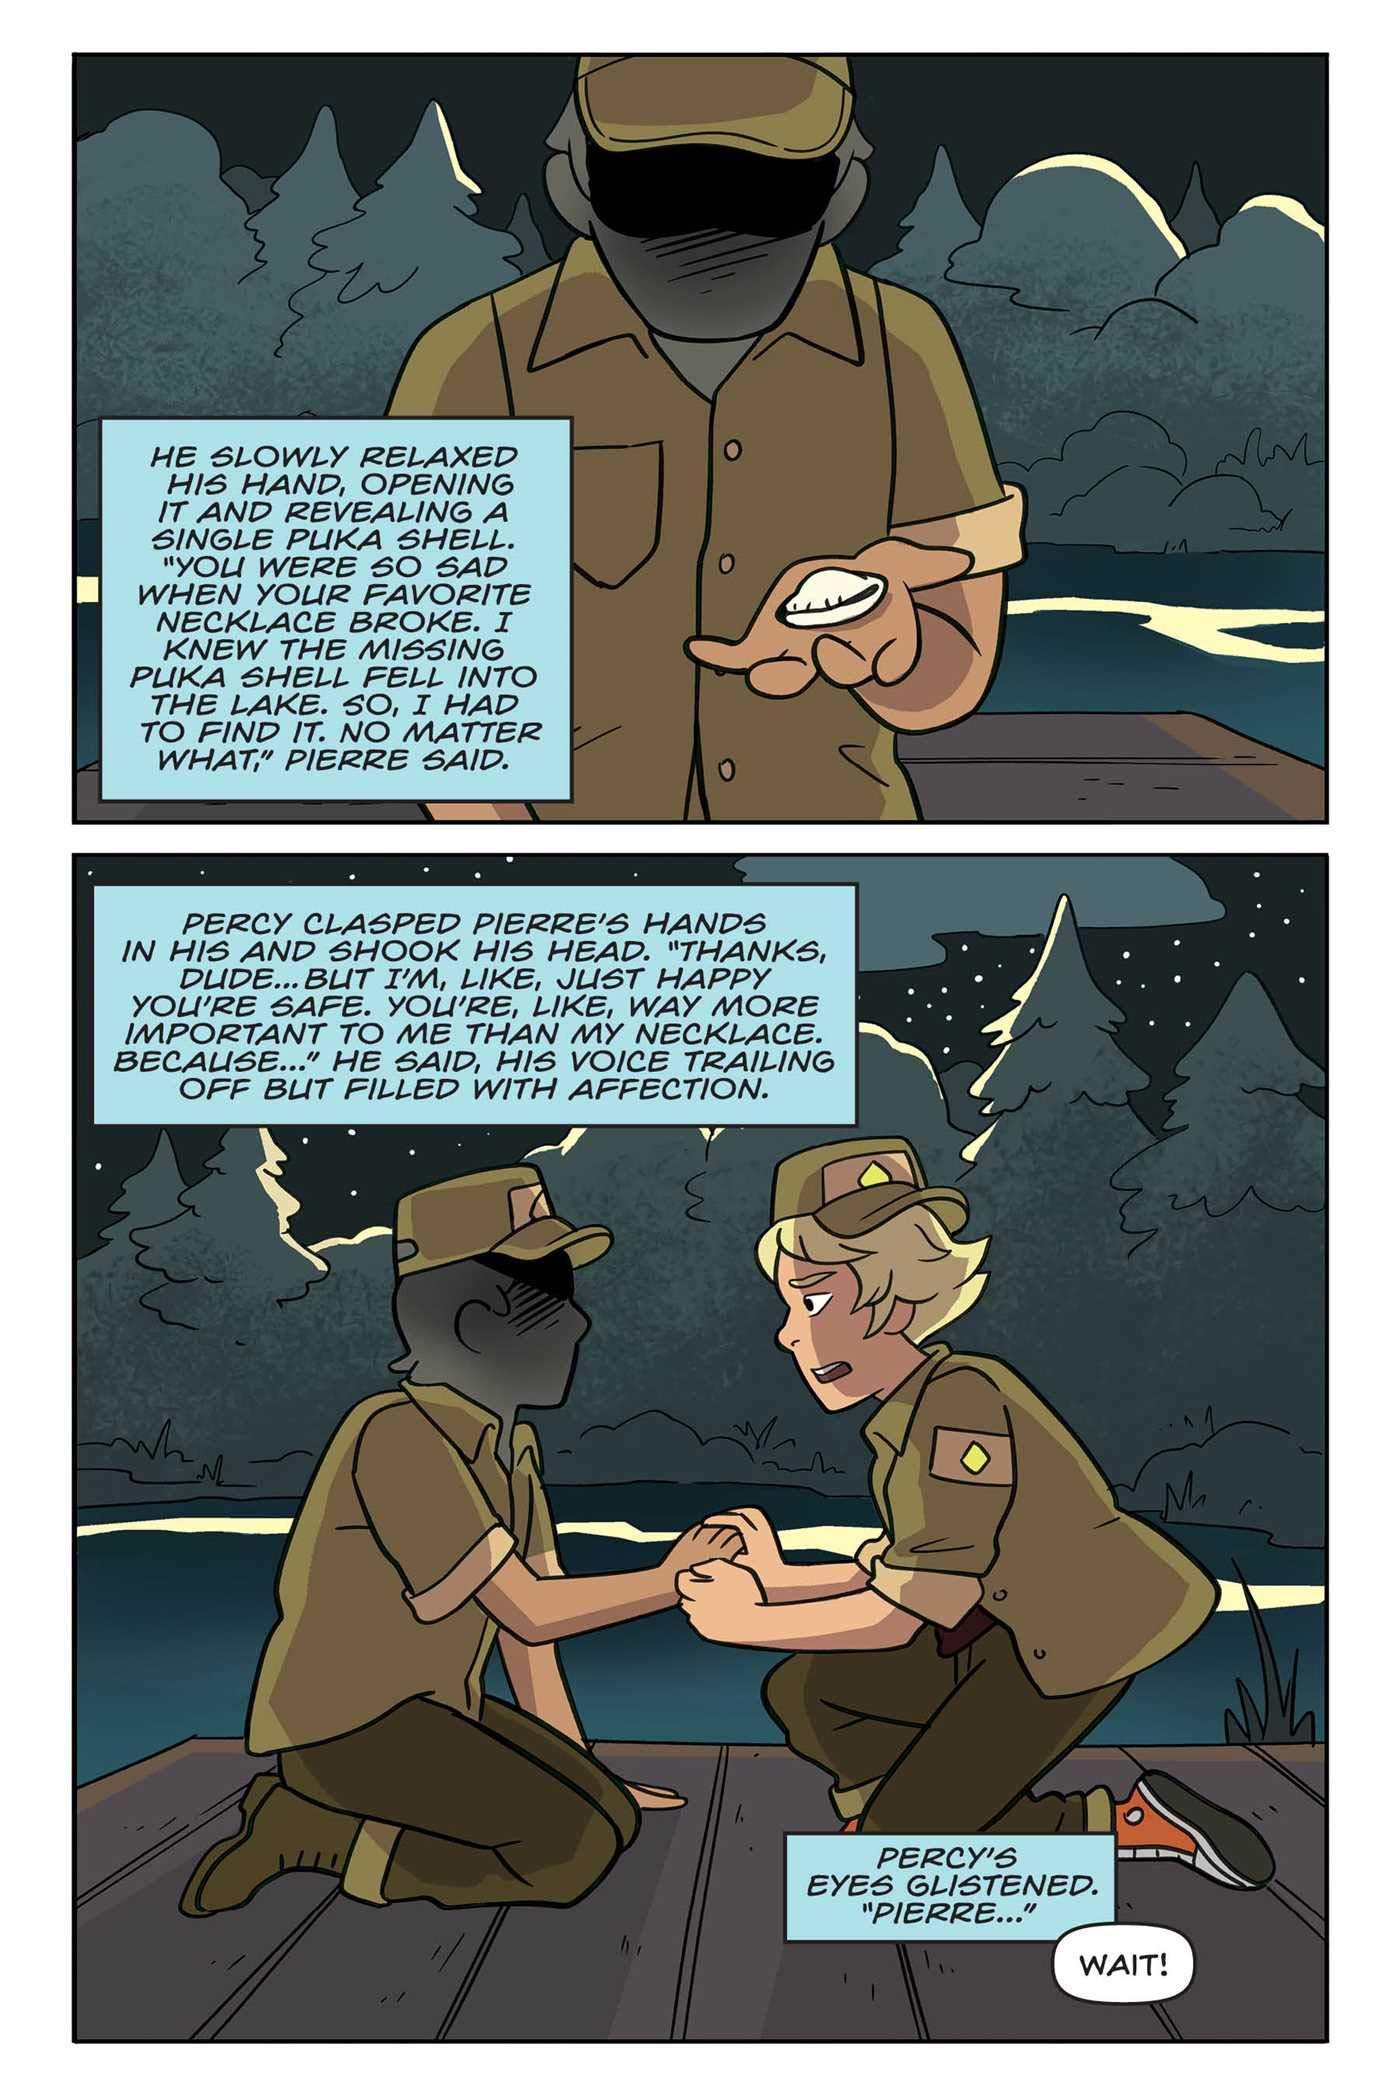 Steven Universe Original Graphic Novel: Camp Pining Play: Nicole